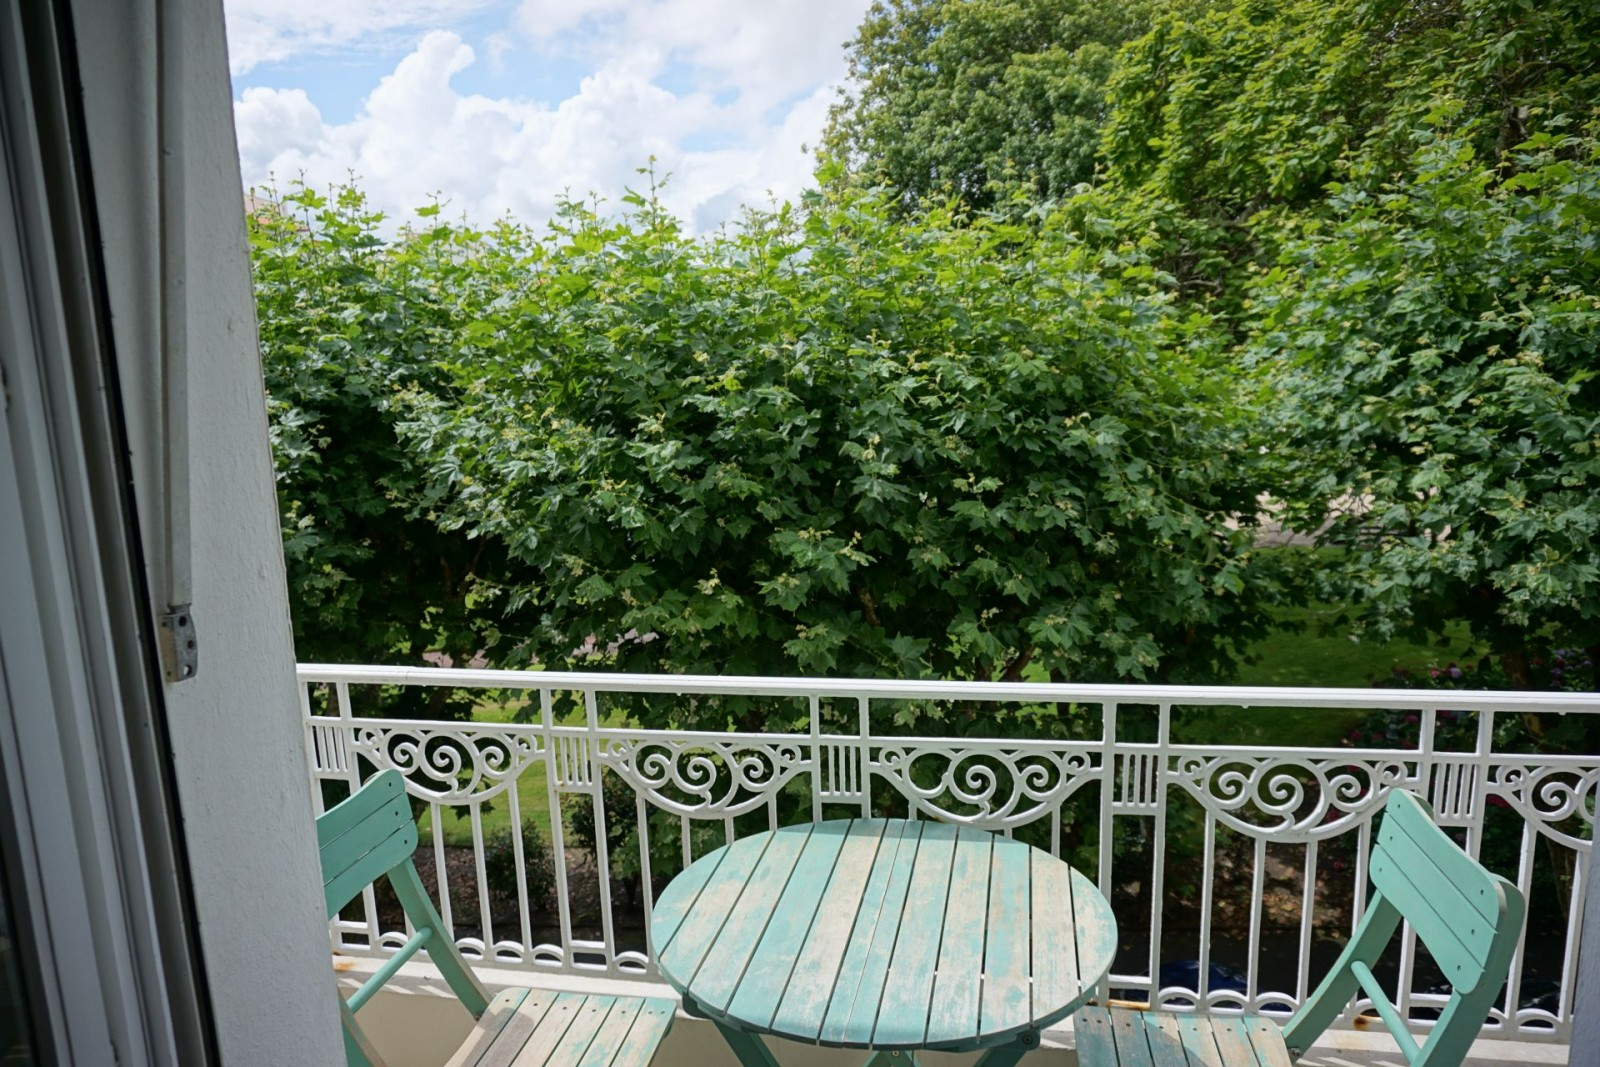 Vue degagee sur le jardin public agence olaizola for Jardin balcon appartement